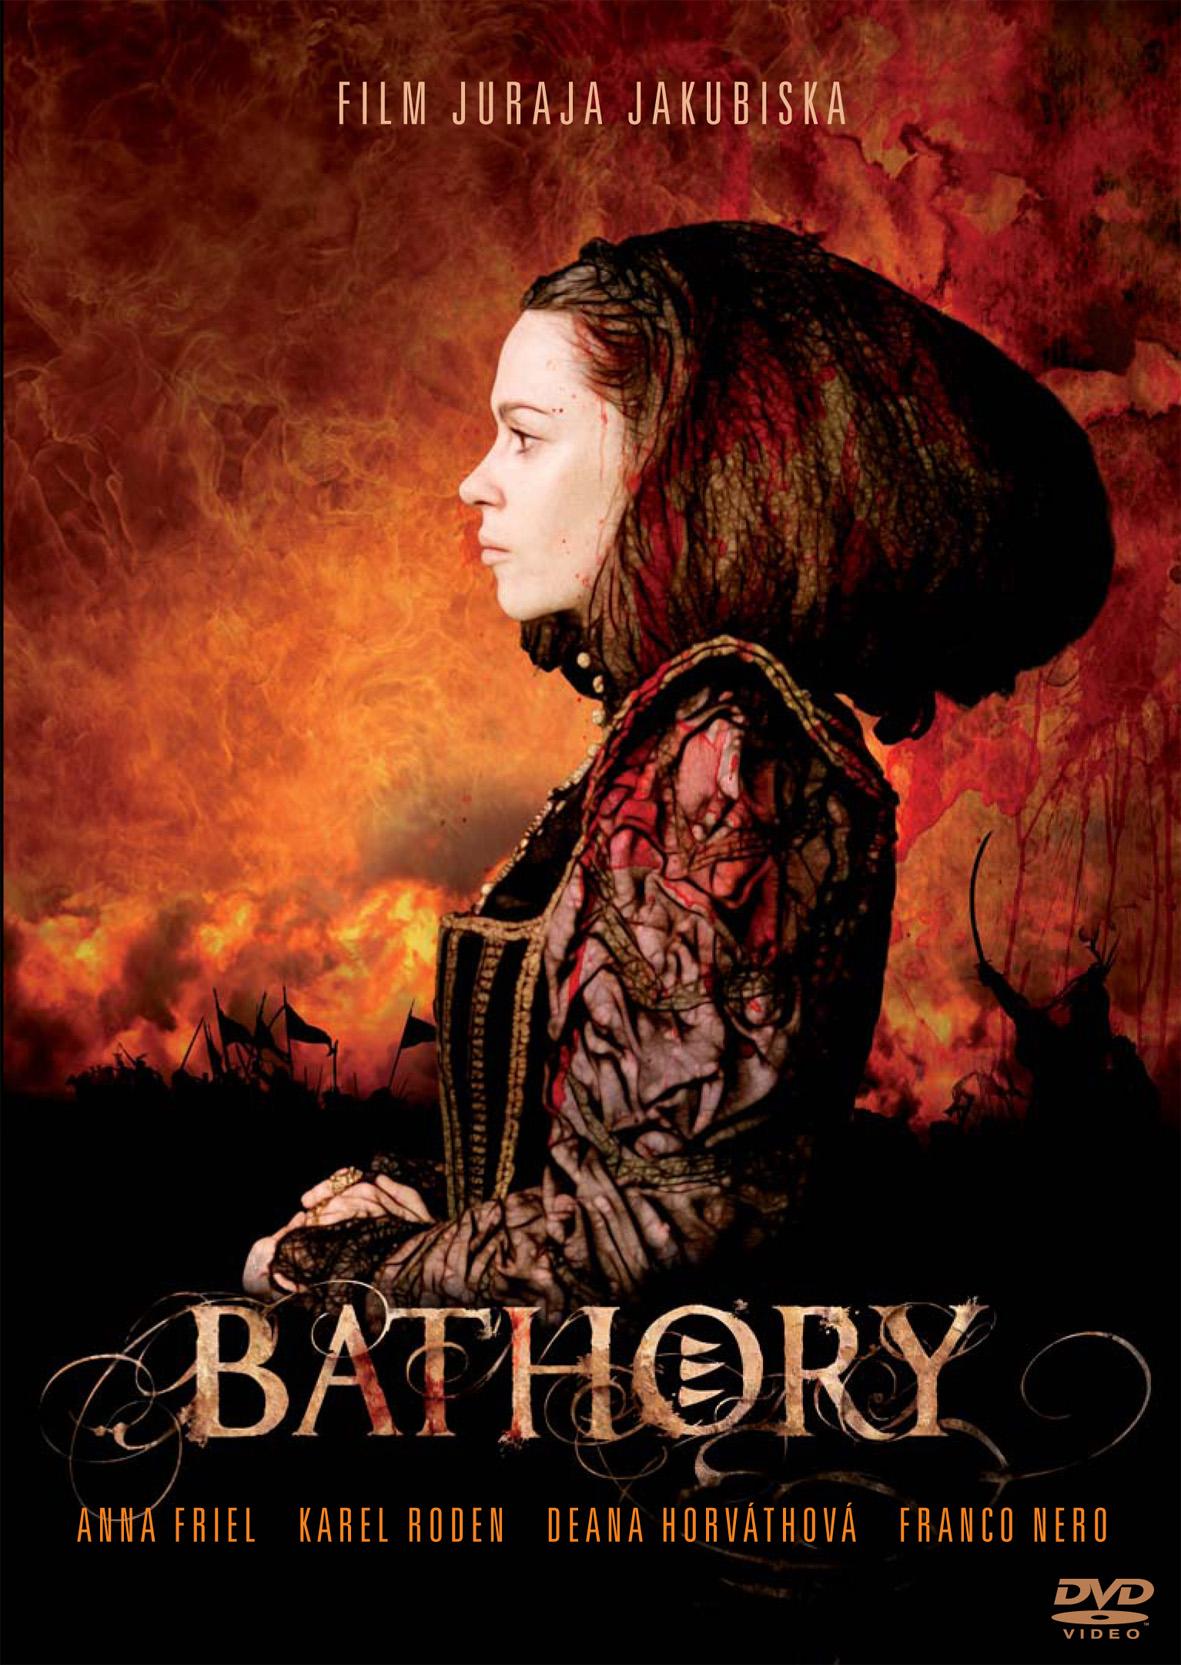 Film Bathory ke stažení - Film Bathory download